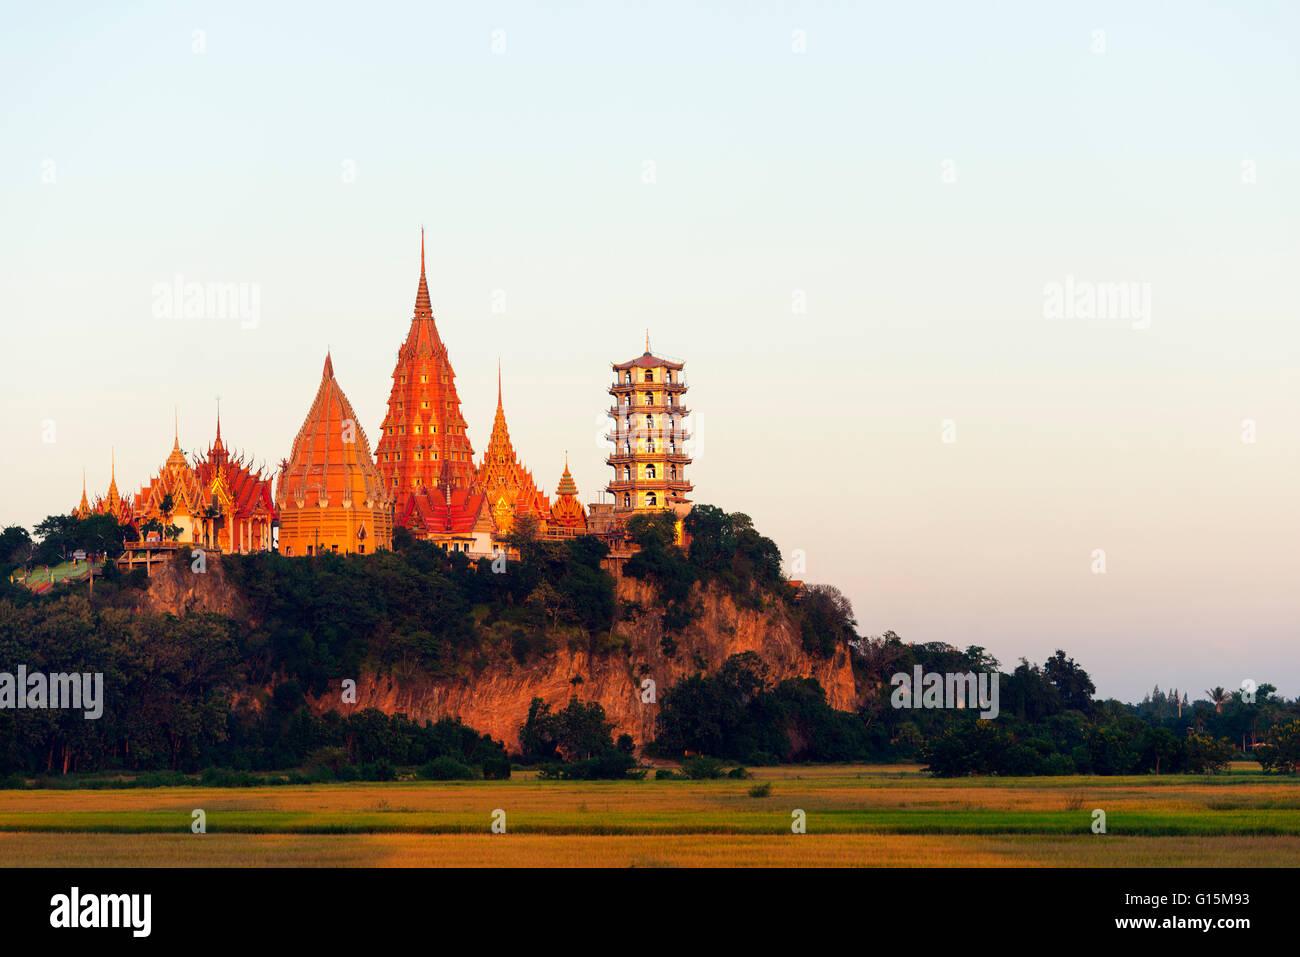 Wat Tham Sua temple, Kanchanaburi, Thailand, Southeast Asia, Asia - Stock Image